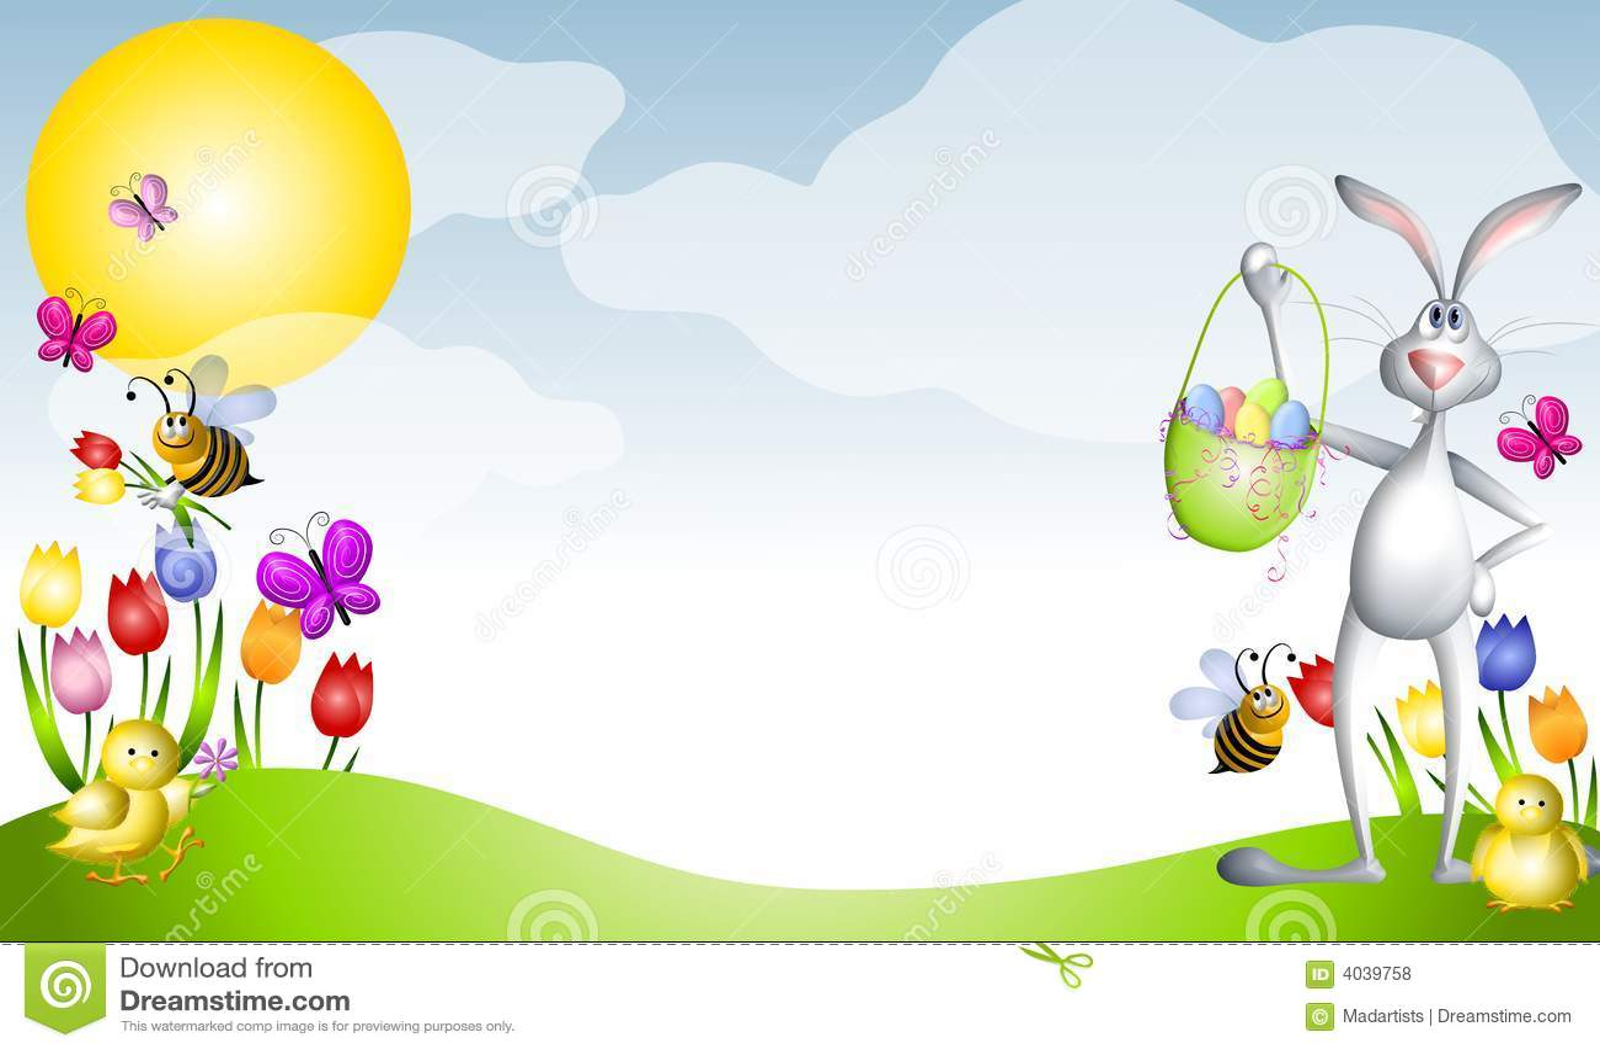 cartoon easter animals spring scene royalty free stock photos